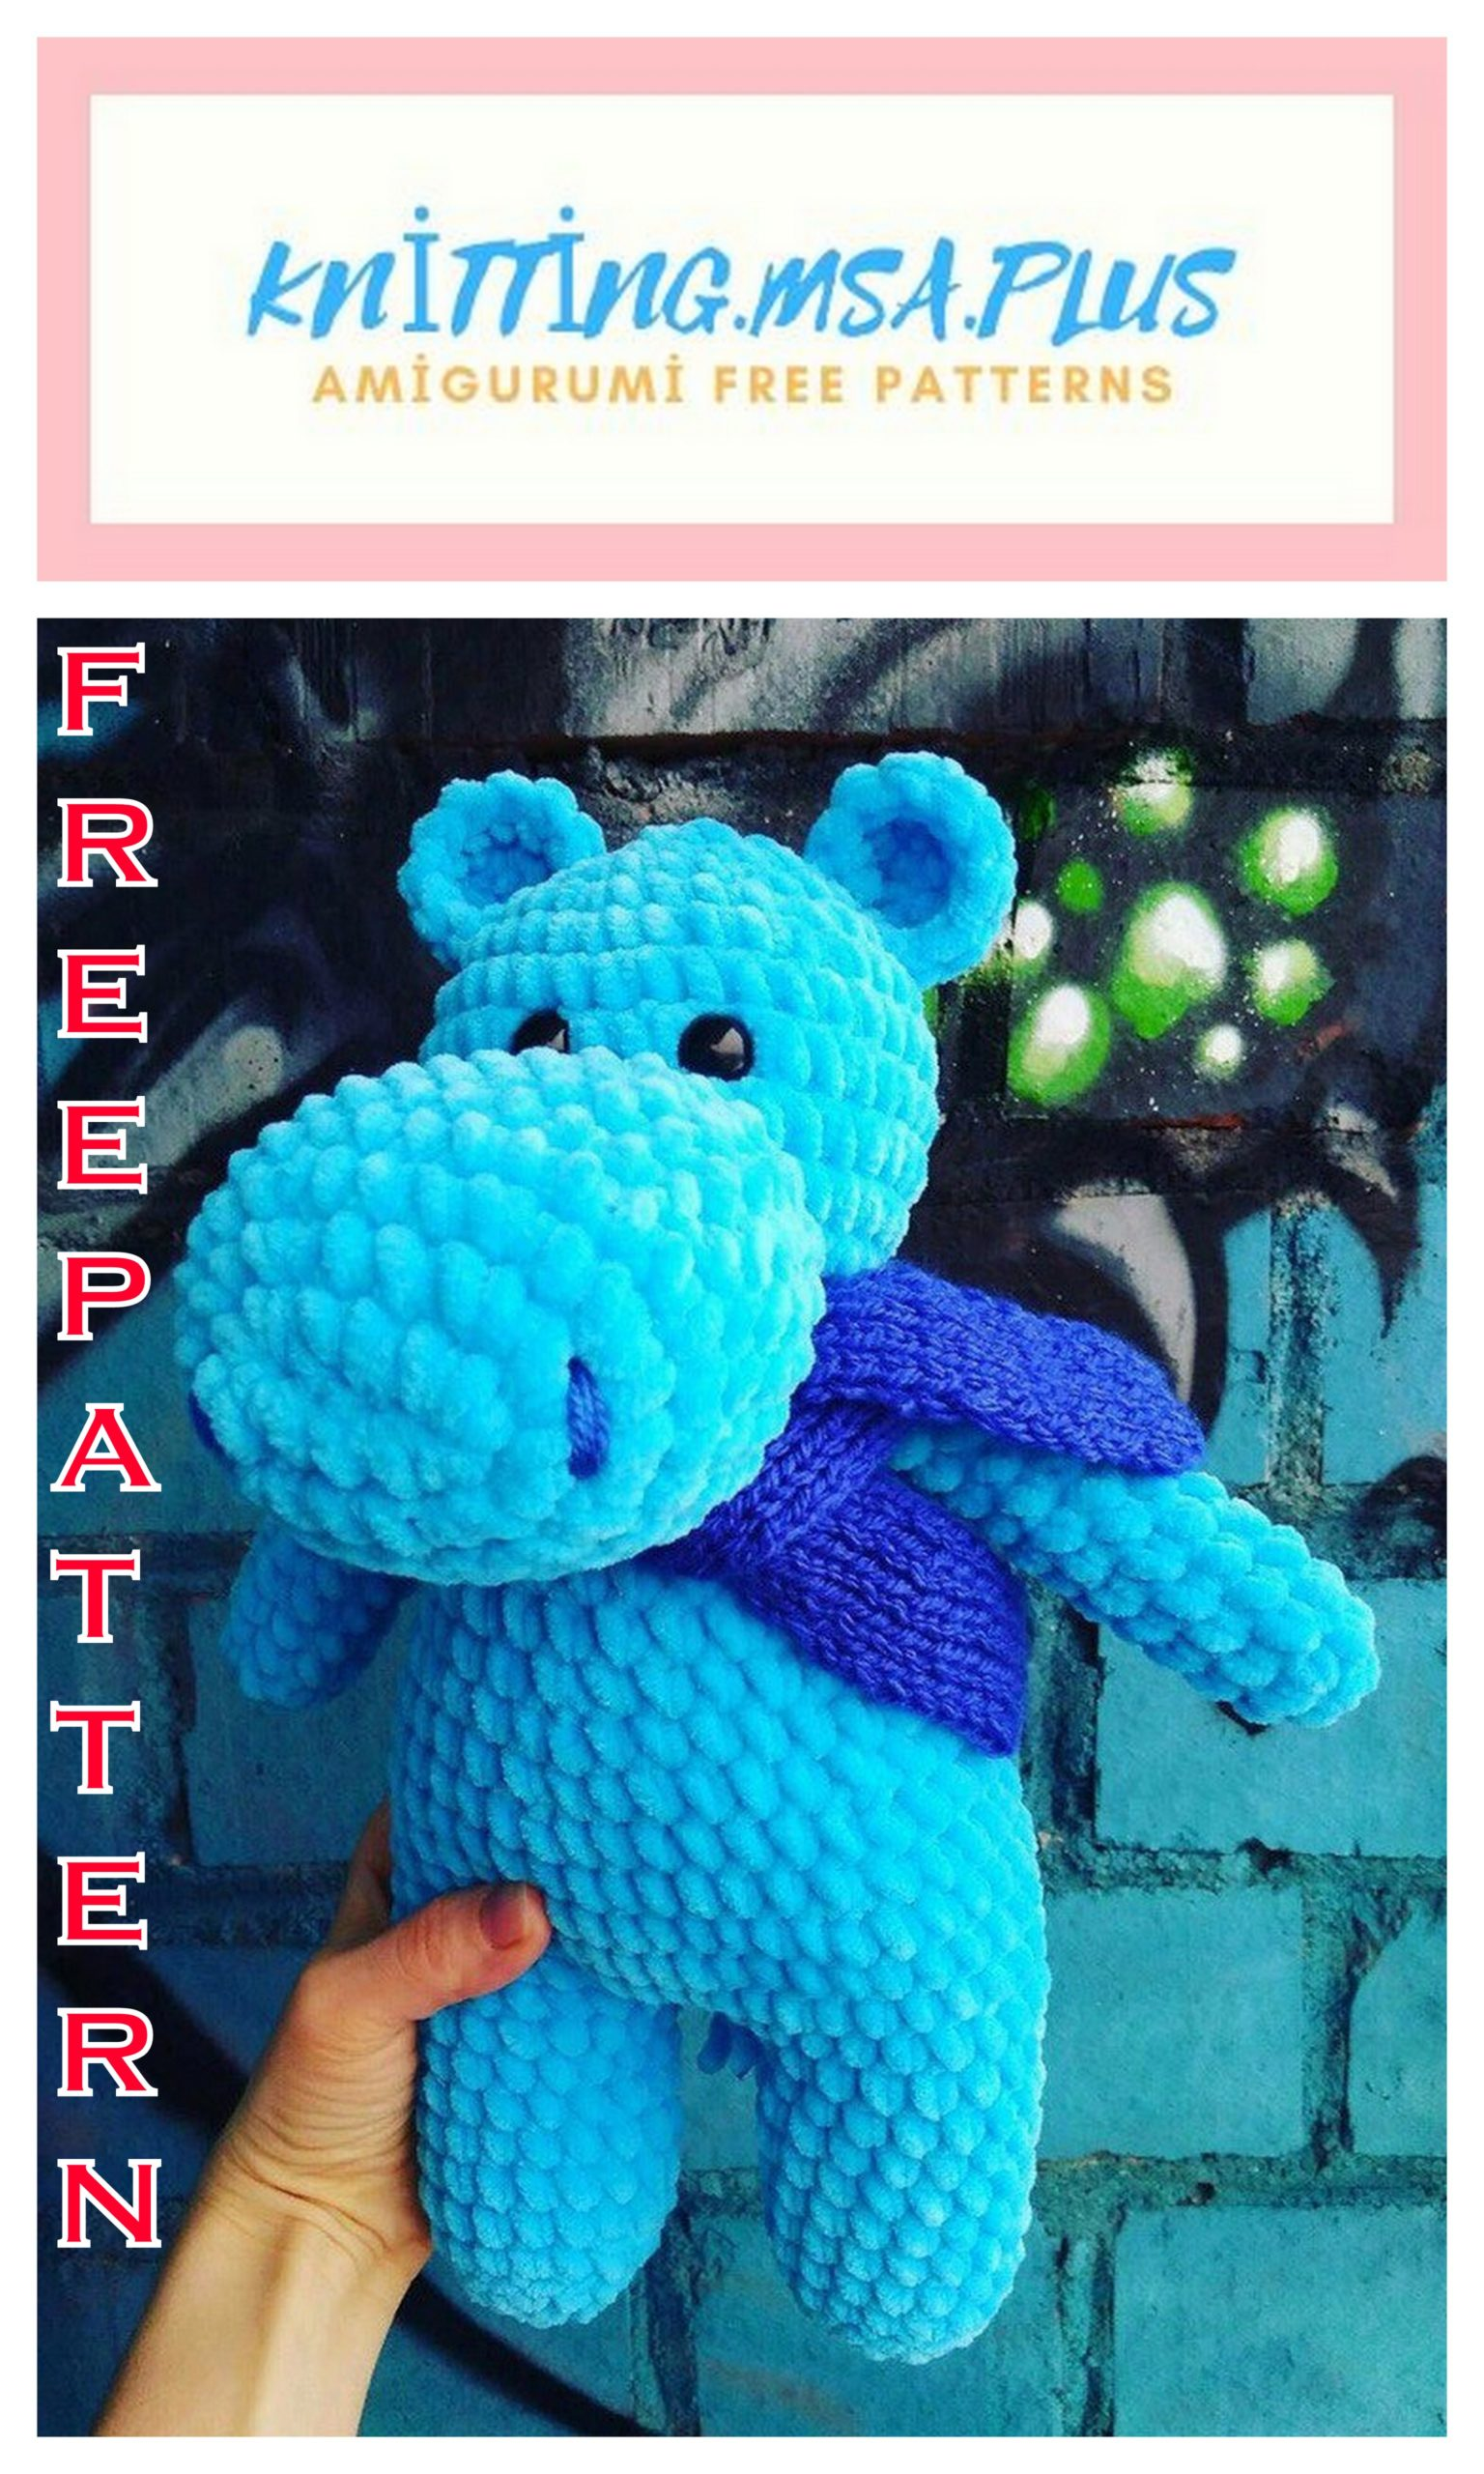 Amigurumi Velvet with Rope Hippo Free Crochet Pattern